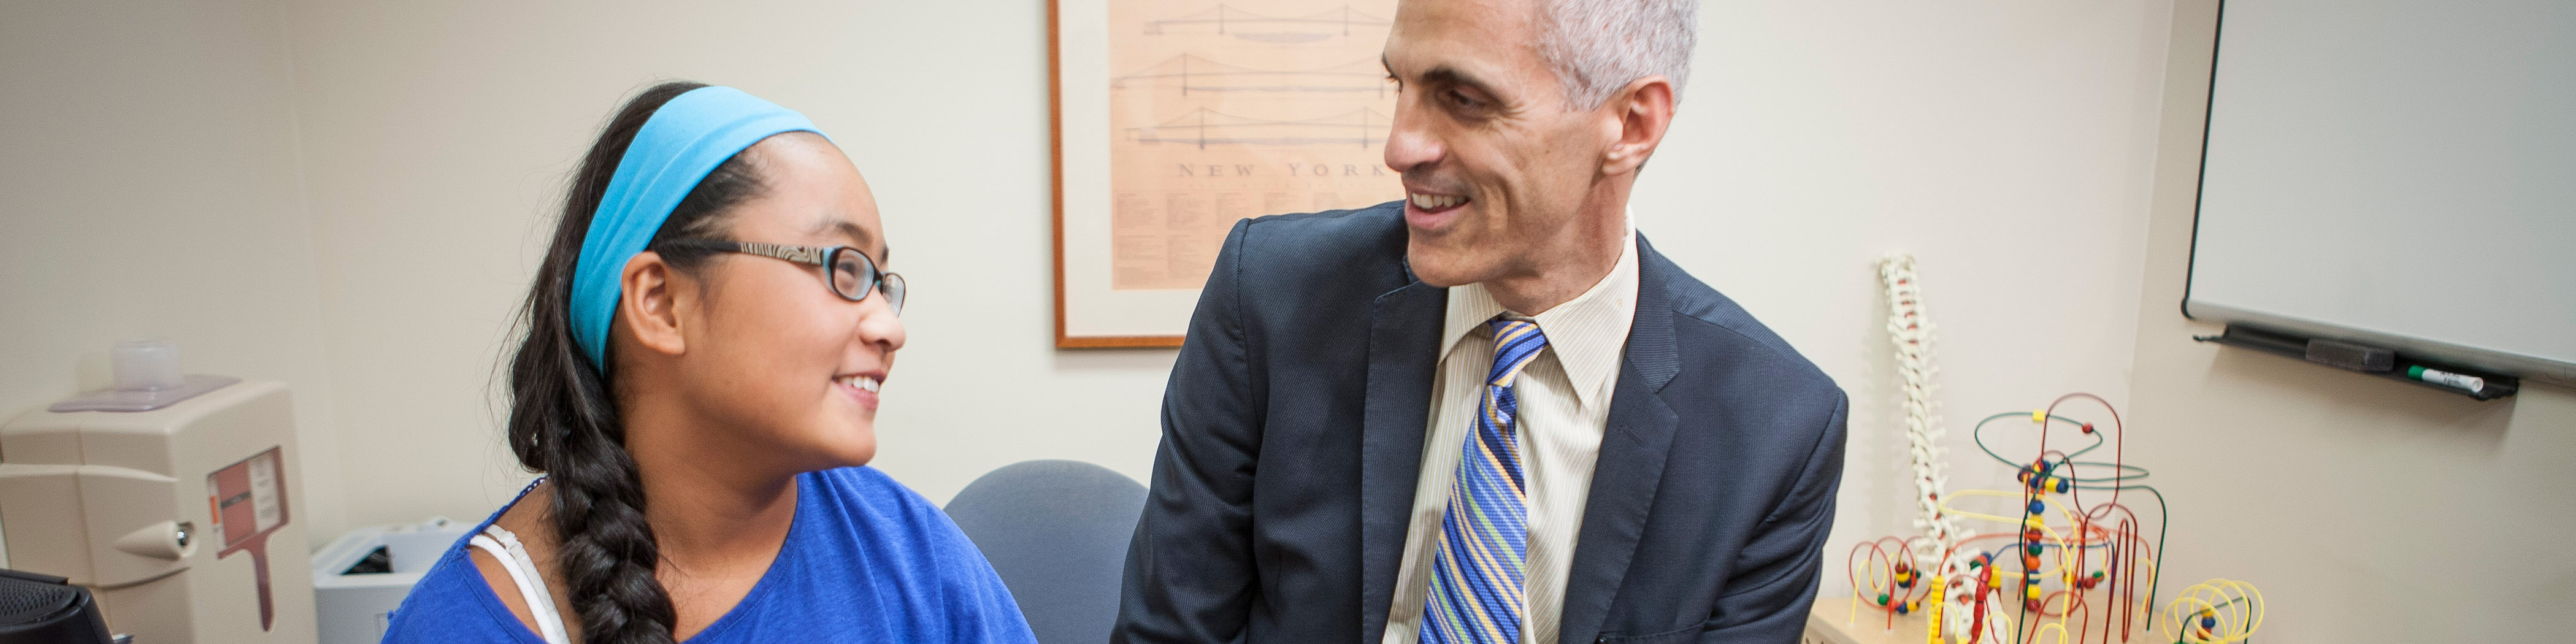 Weill Cornell Medicine Neurosurgery Patient Care